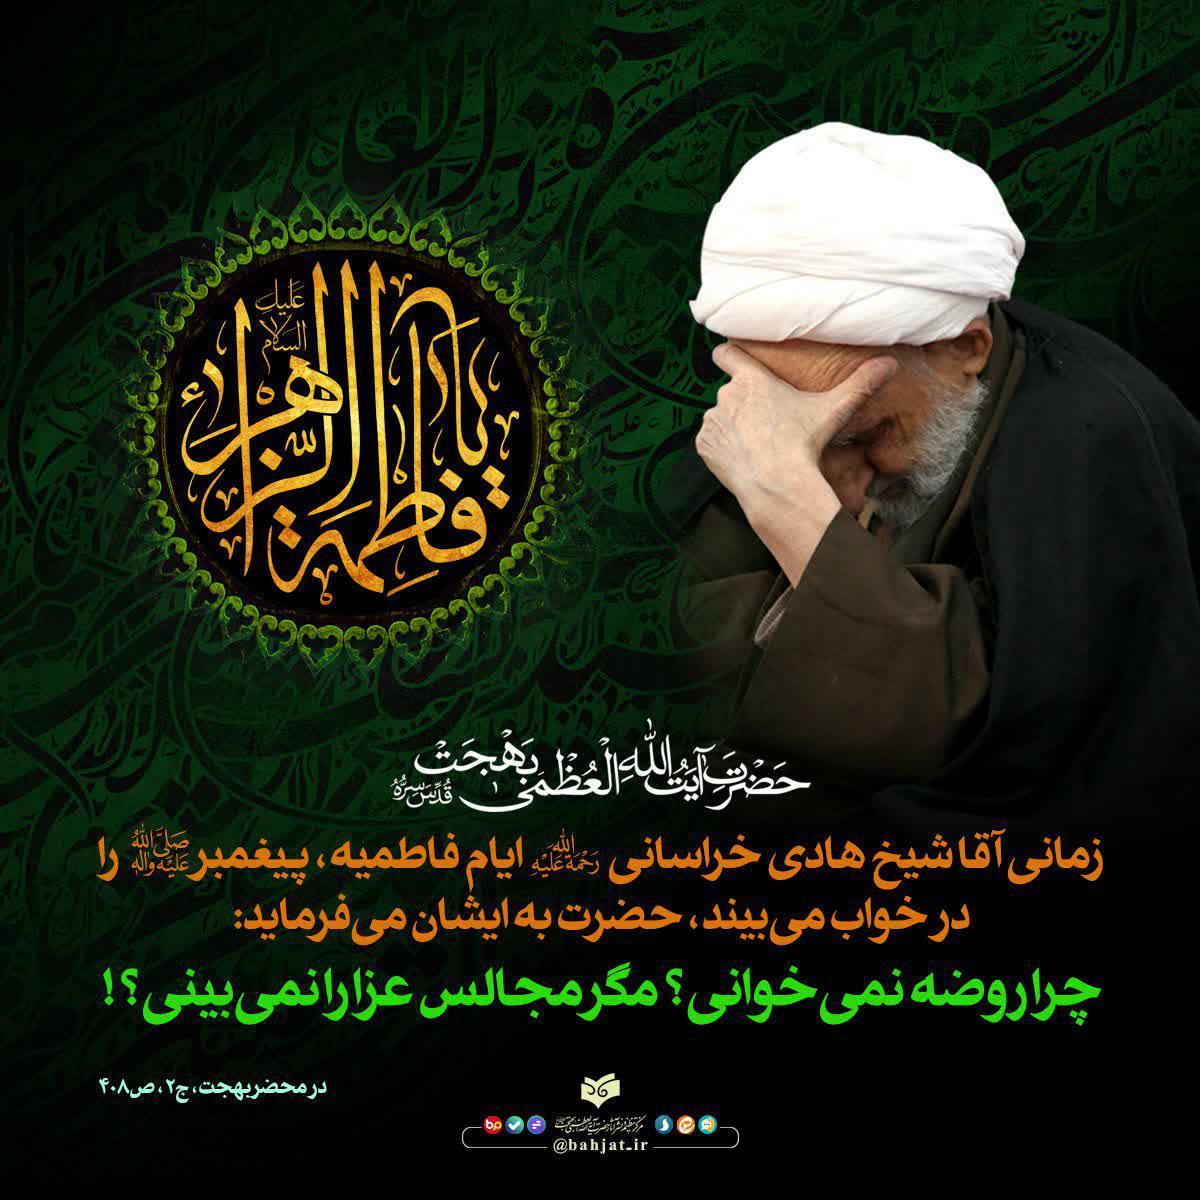 🏴 شهادت حضرت فاطمه زهرا علیهاالسلام تسلیت باد.